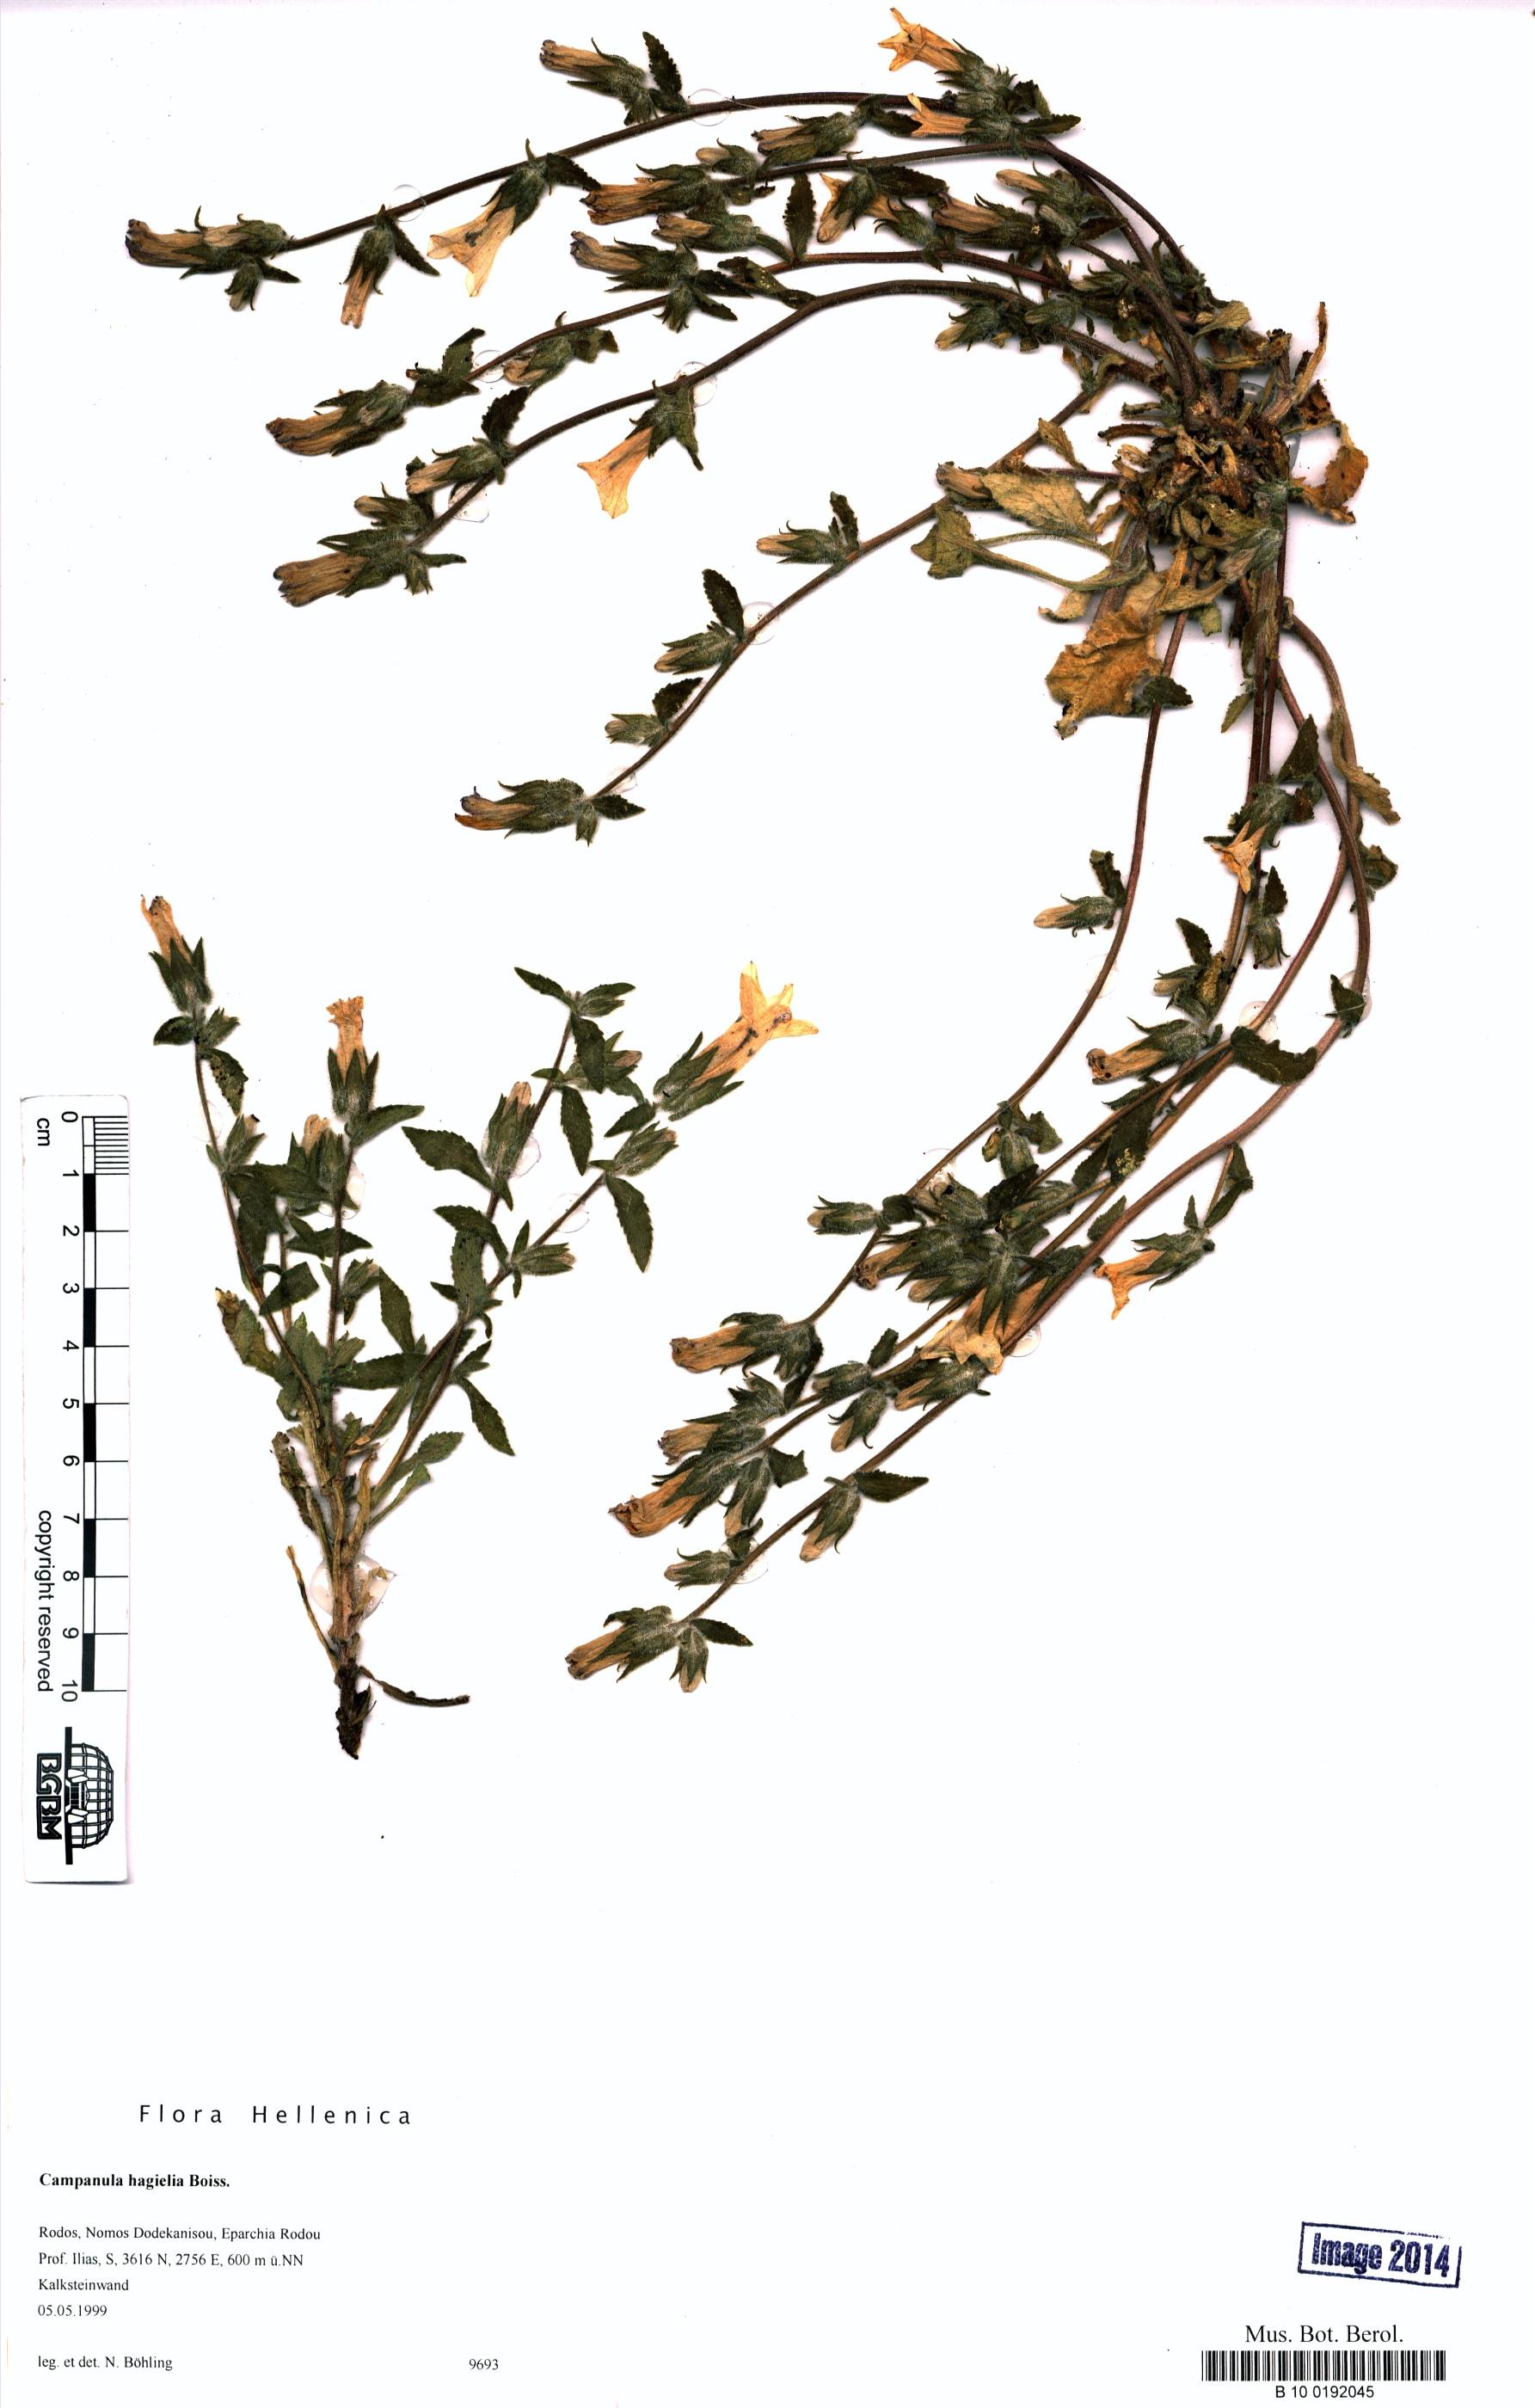 http://ww2.bgbm.org/herbarium/images/B/10/01/92/04/B_10_0192045.jpg